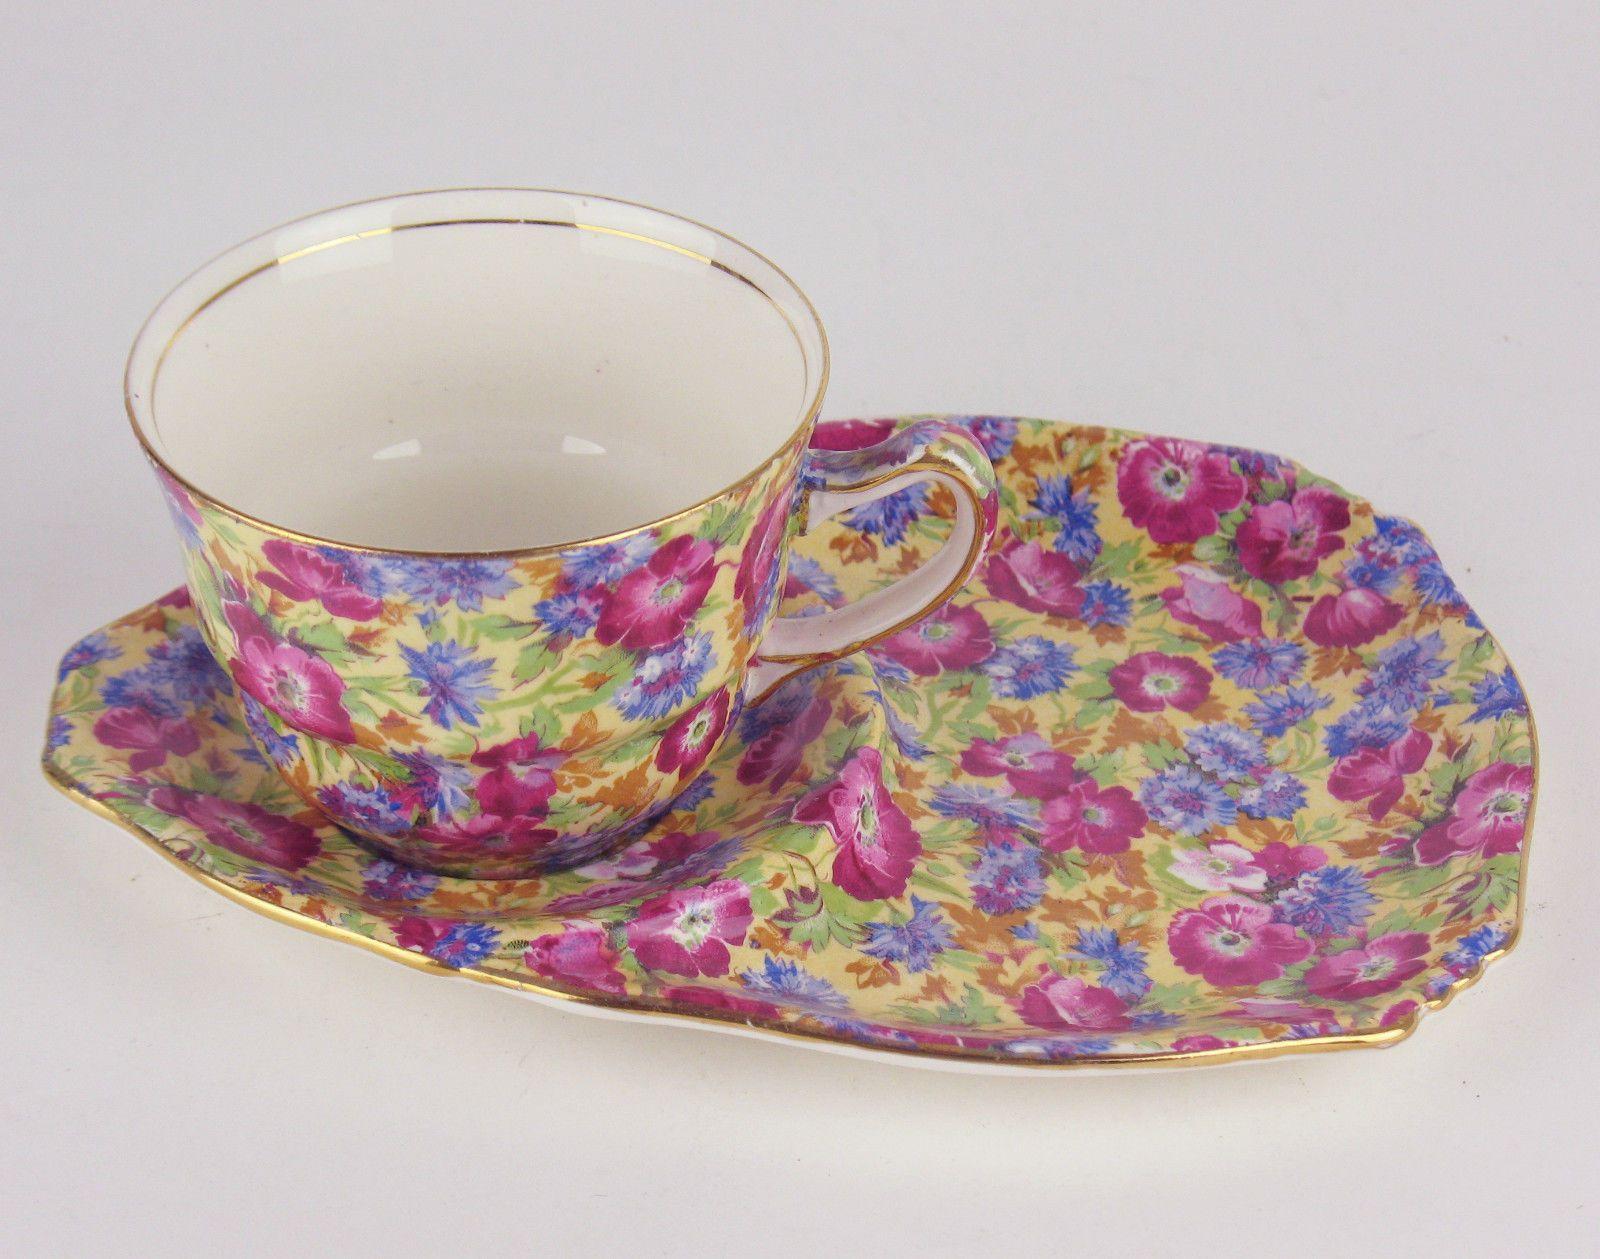 Royal albert bone china tea cup amp saucer winsome pattern ebay - Tea Biscuit Tennis Set Royal Winton Royalty Chintz Earthenware England Ebay